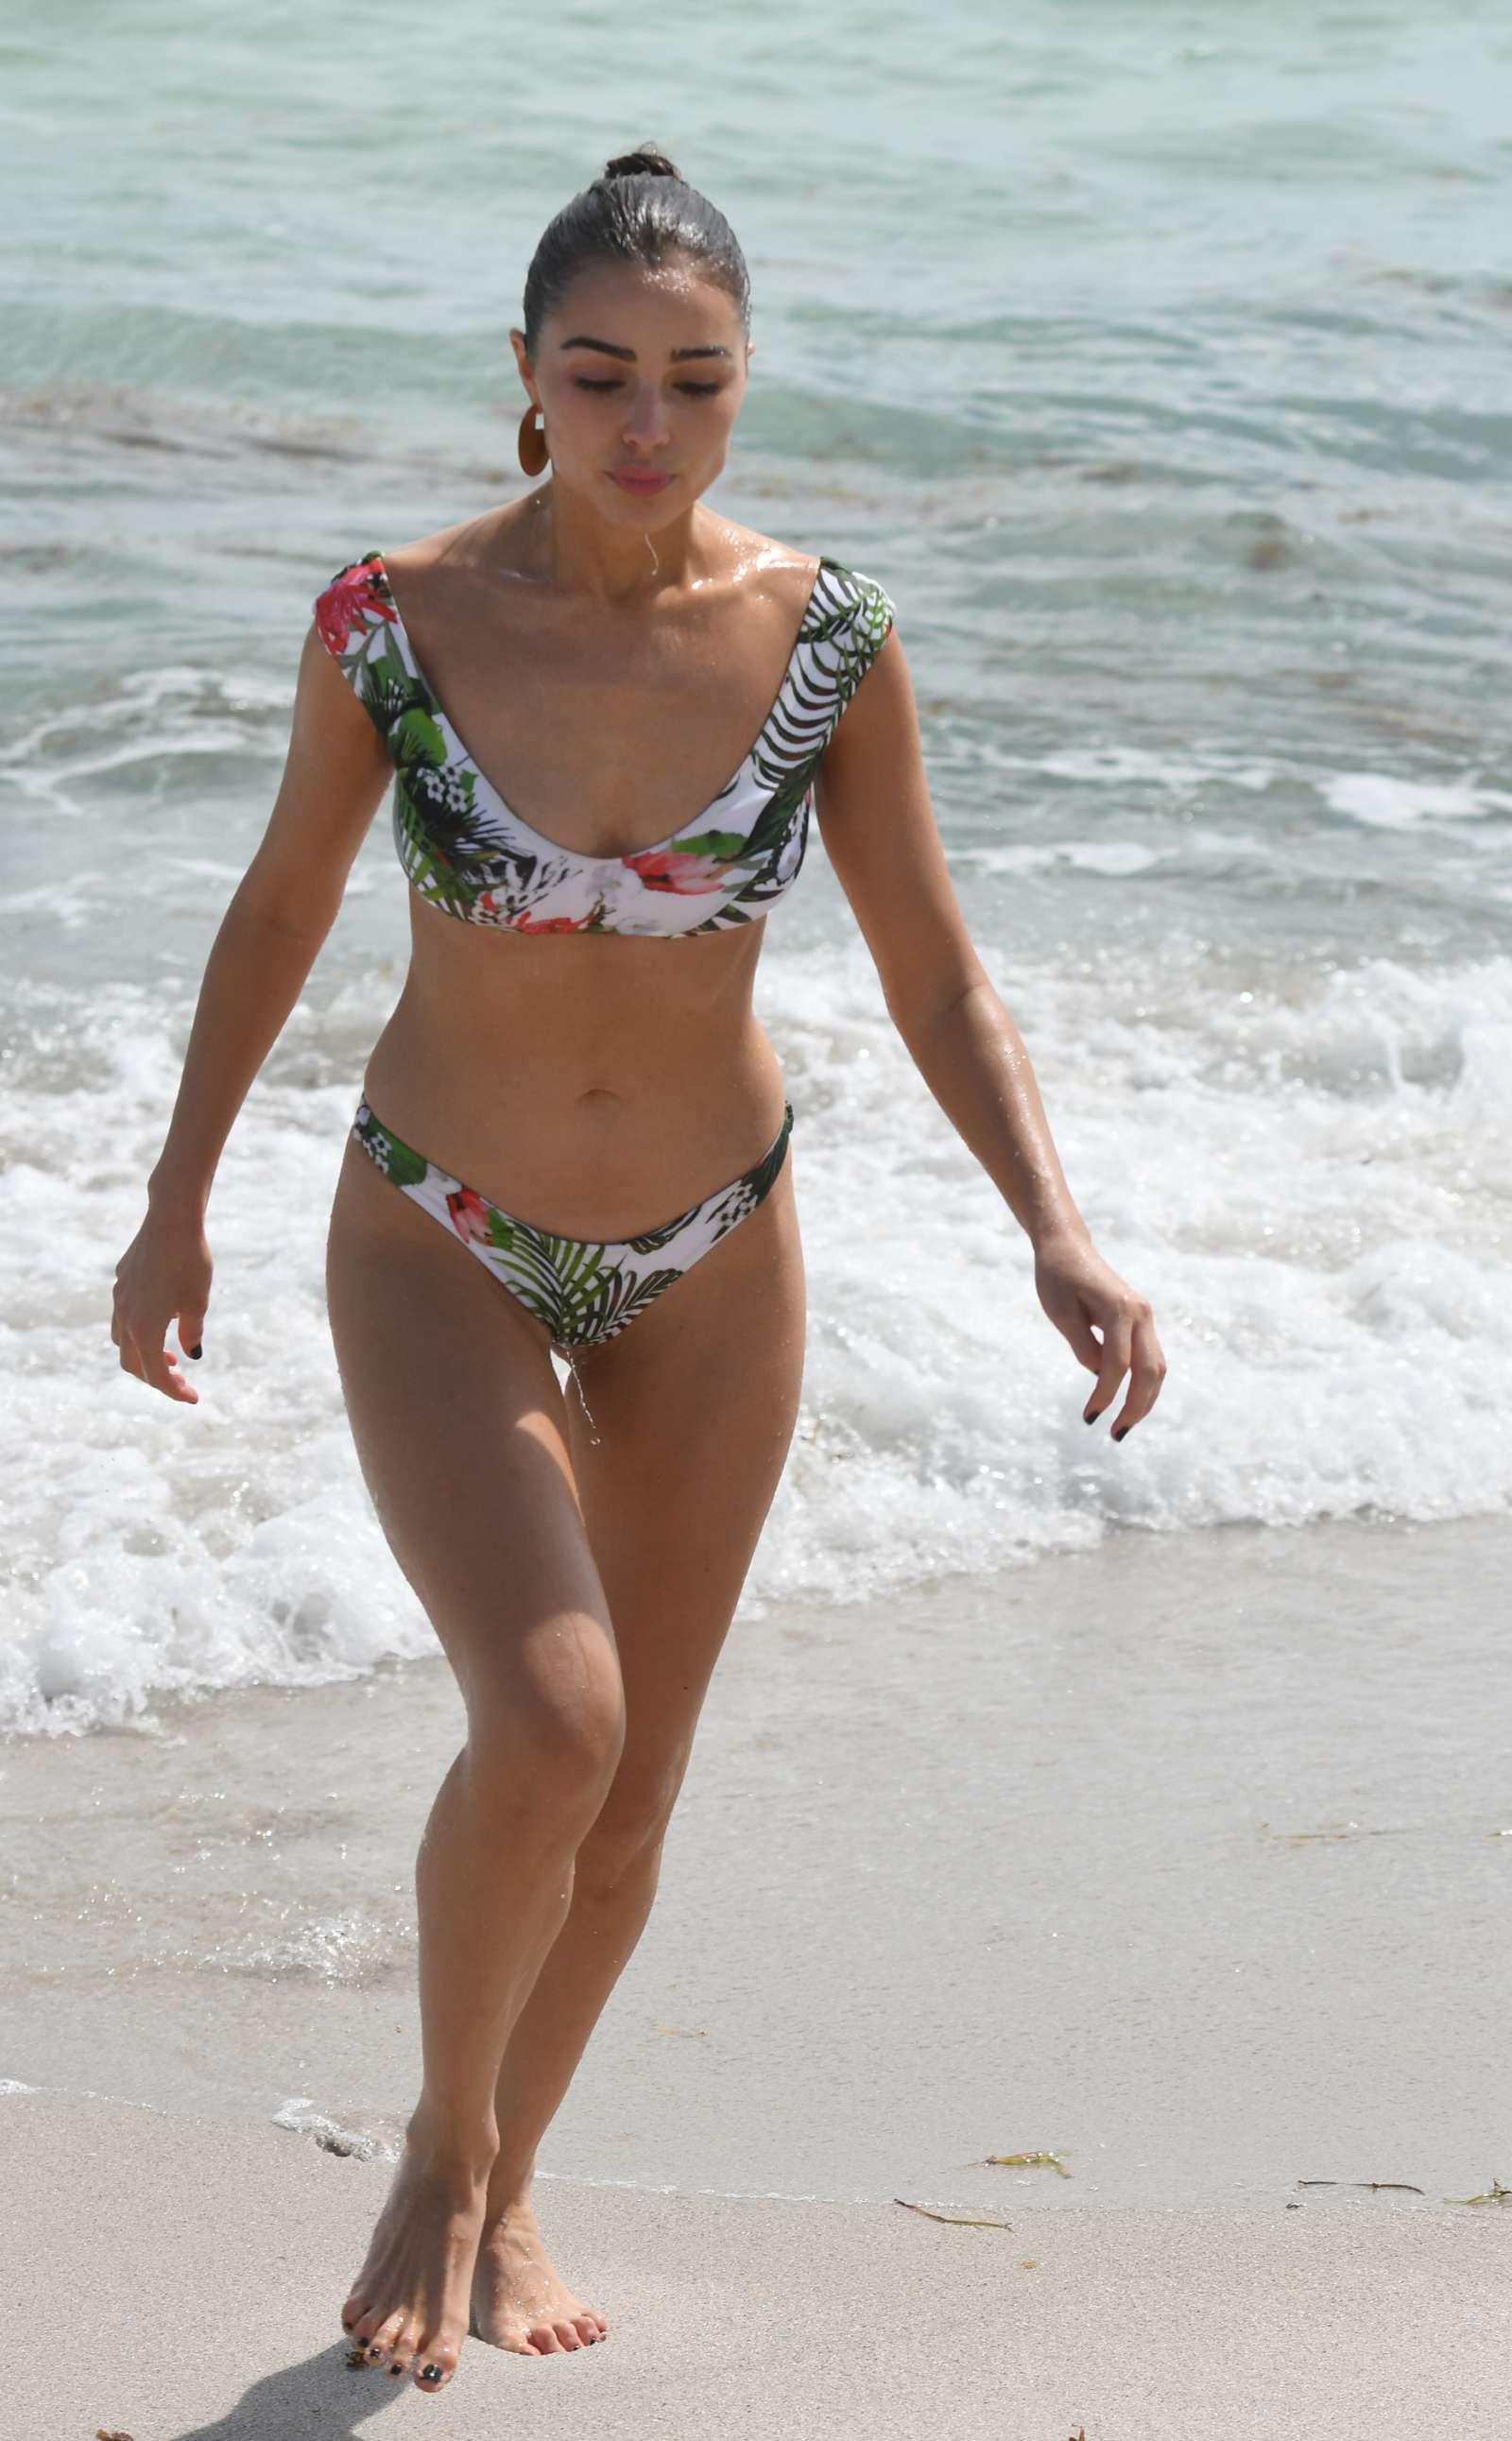 Olivia Culpo 2017 : Olivia Culpo and Devon Windsor: Bikini Photoshoot 2017 -38